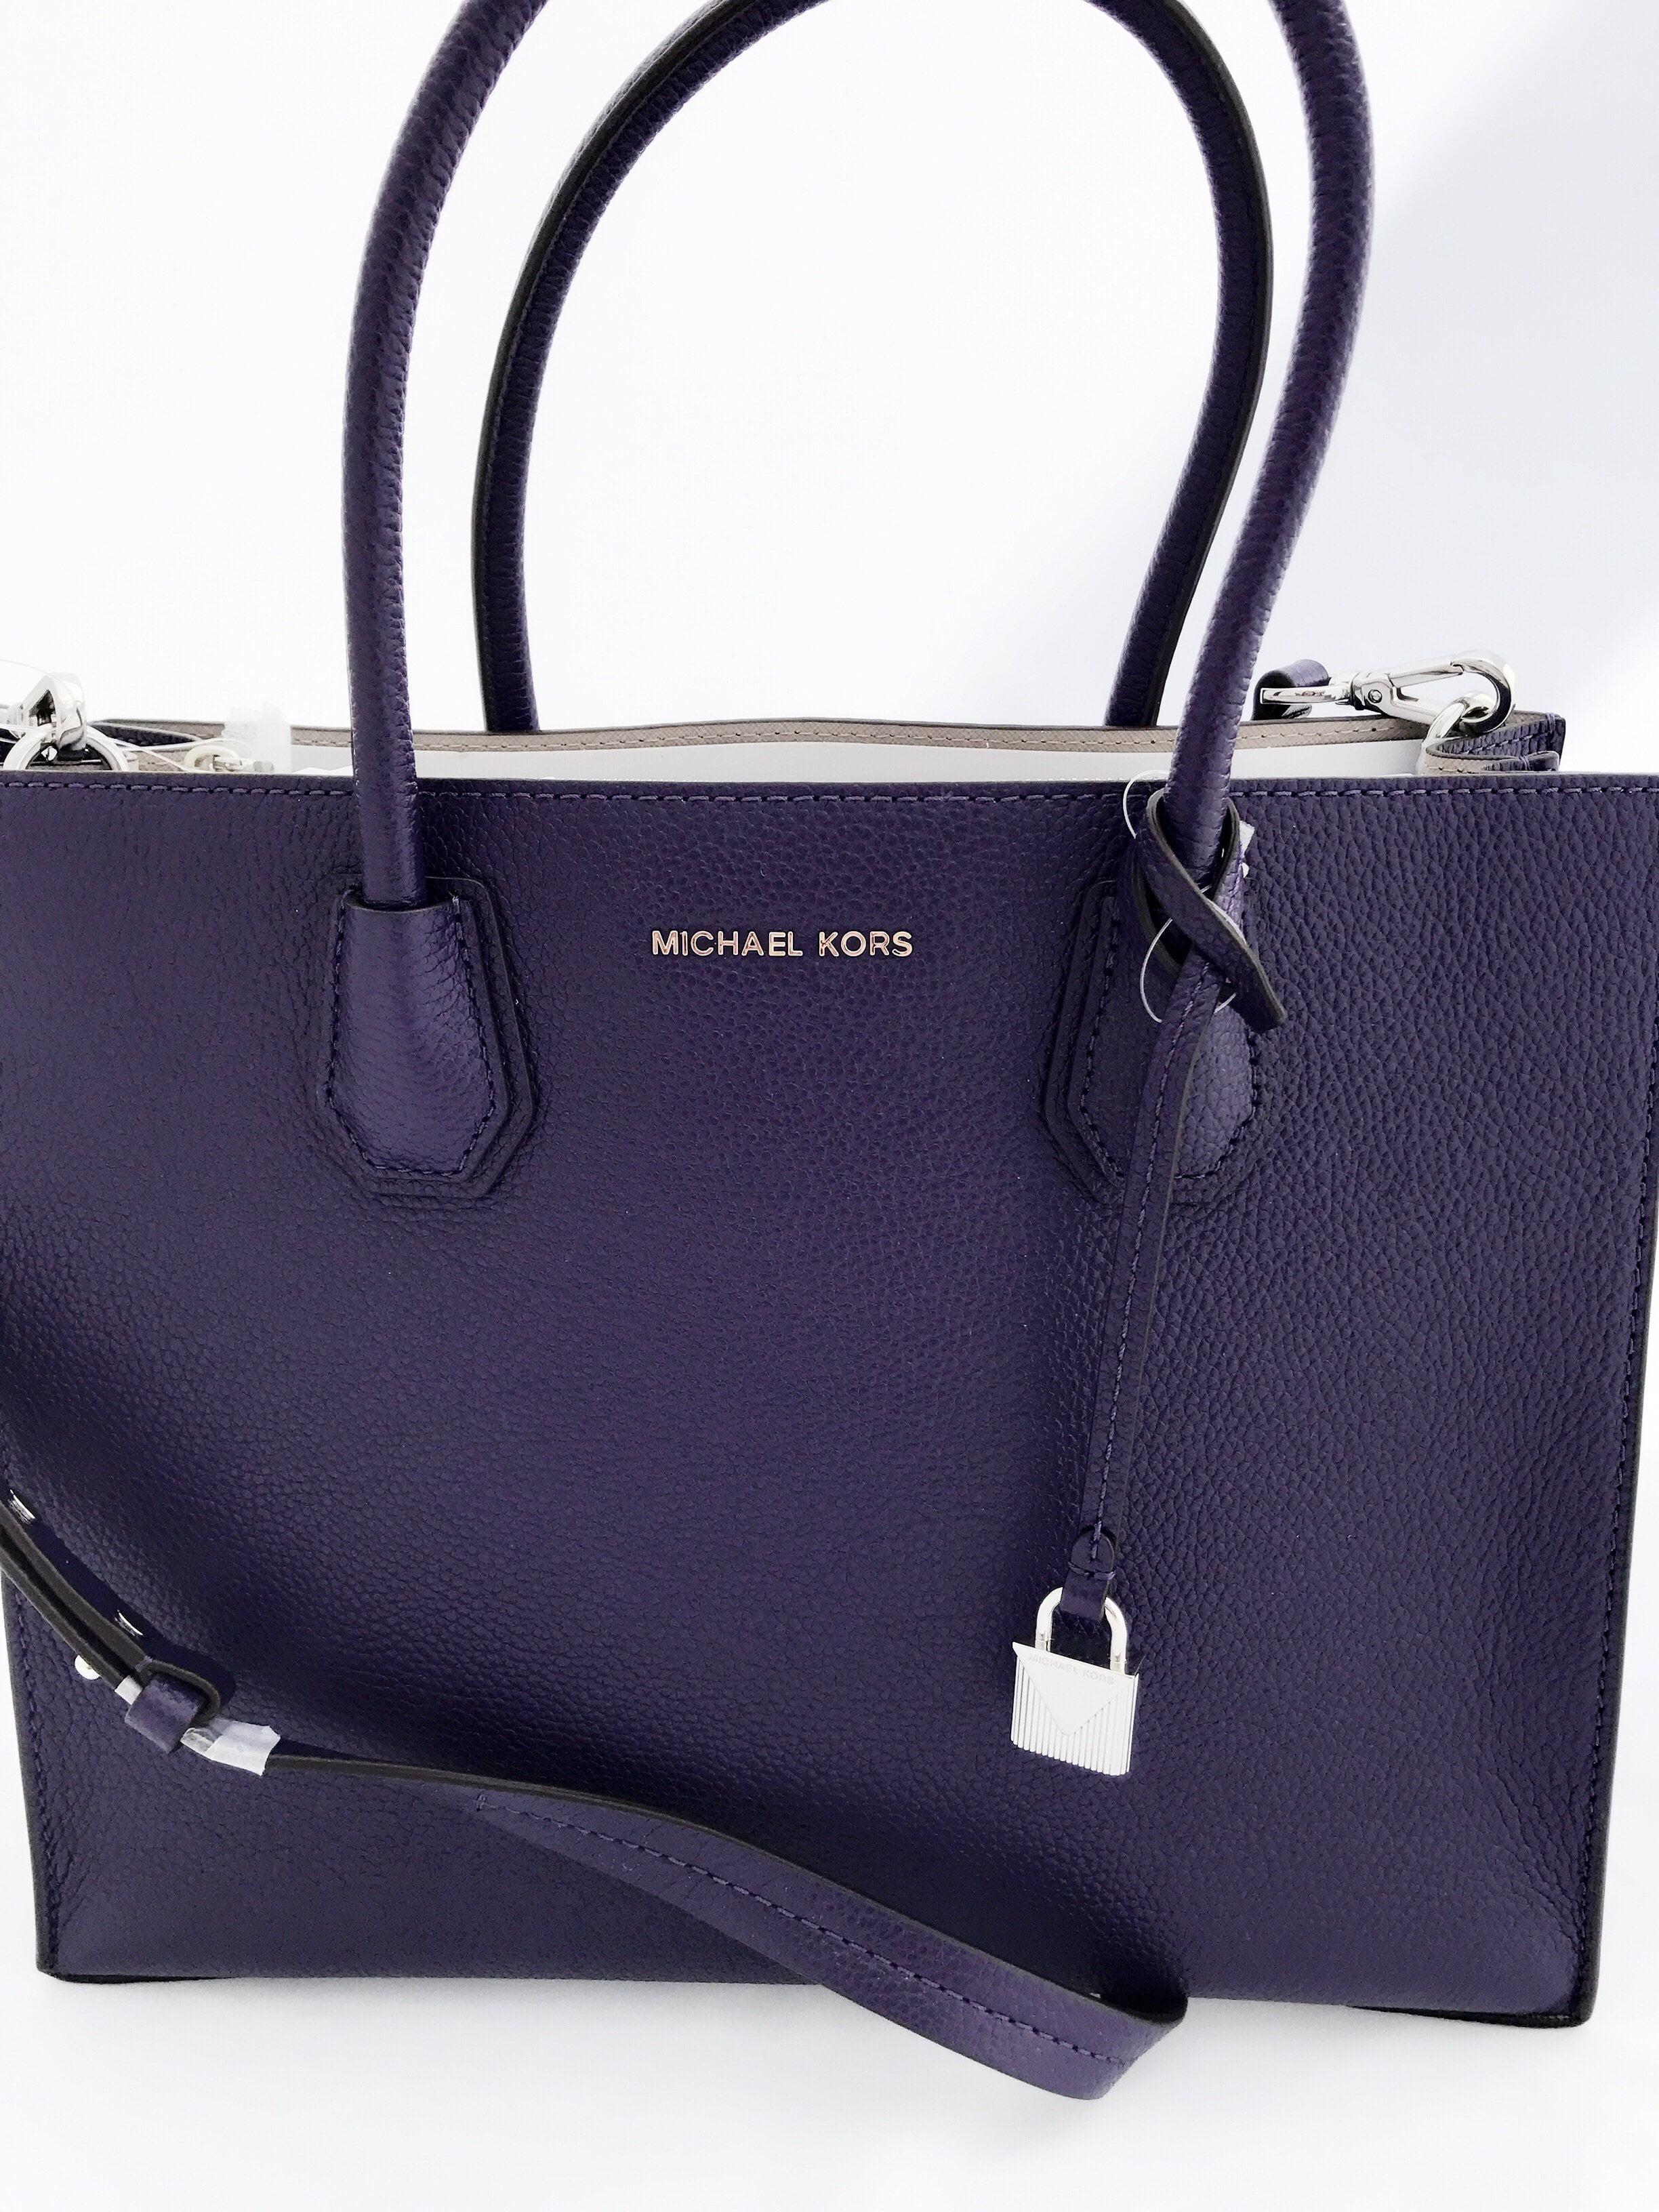 84014cbe9a46 ... greece nwt michael kors mercer studio large convertible tote iris  purple satchel bag walmart 0f550 7596a